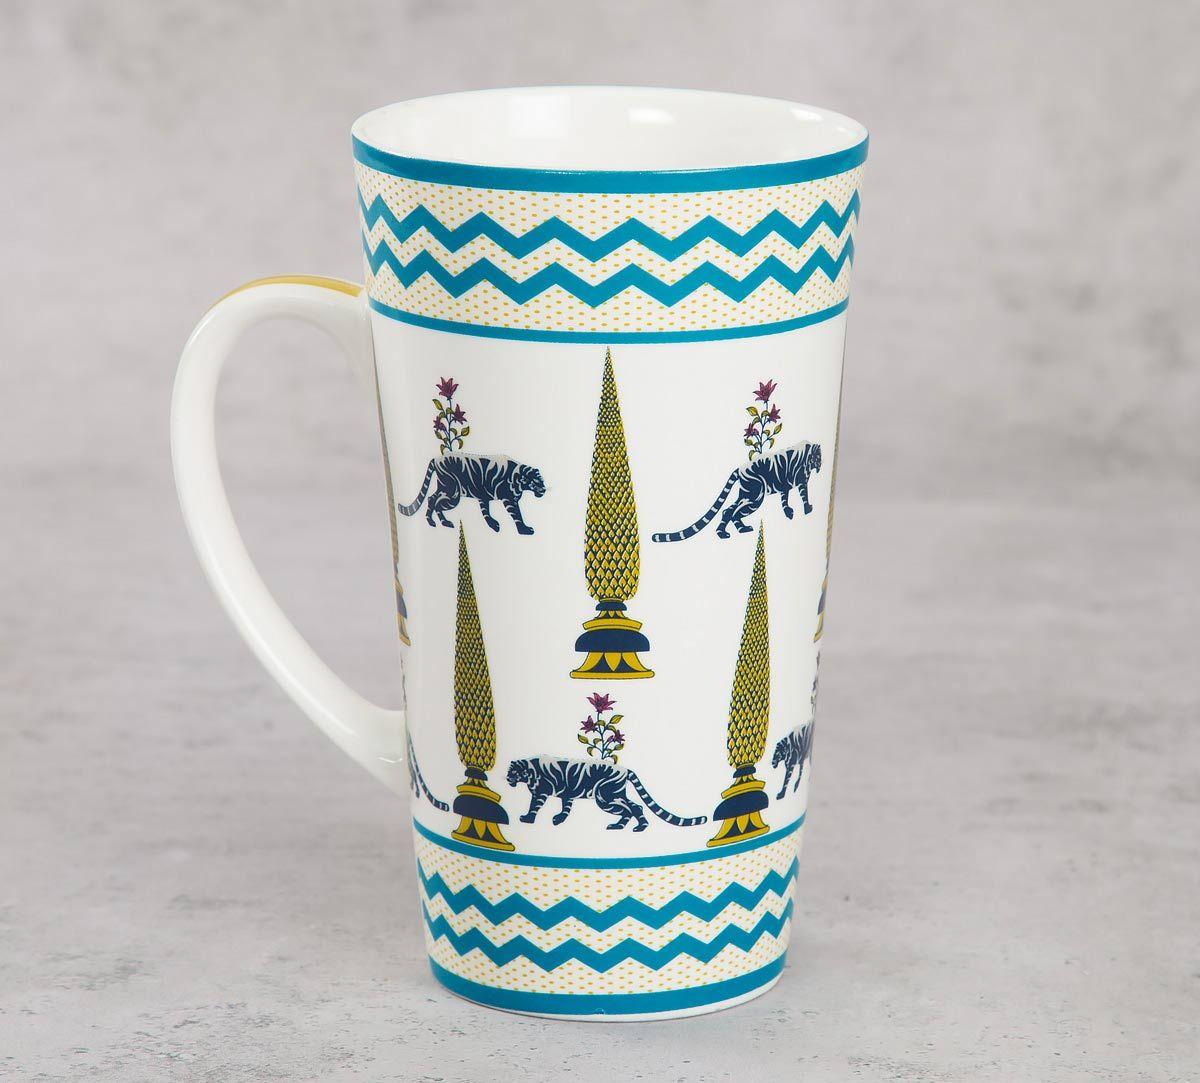 India Circus Mystical Garden Conical Mug (Set of 2)